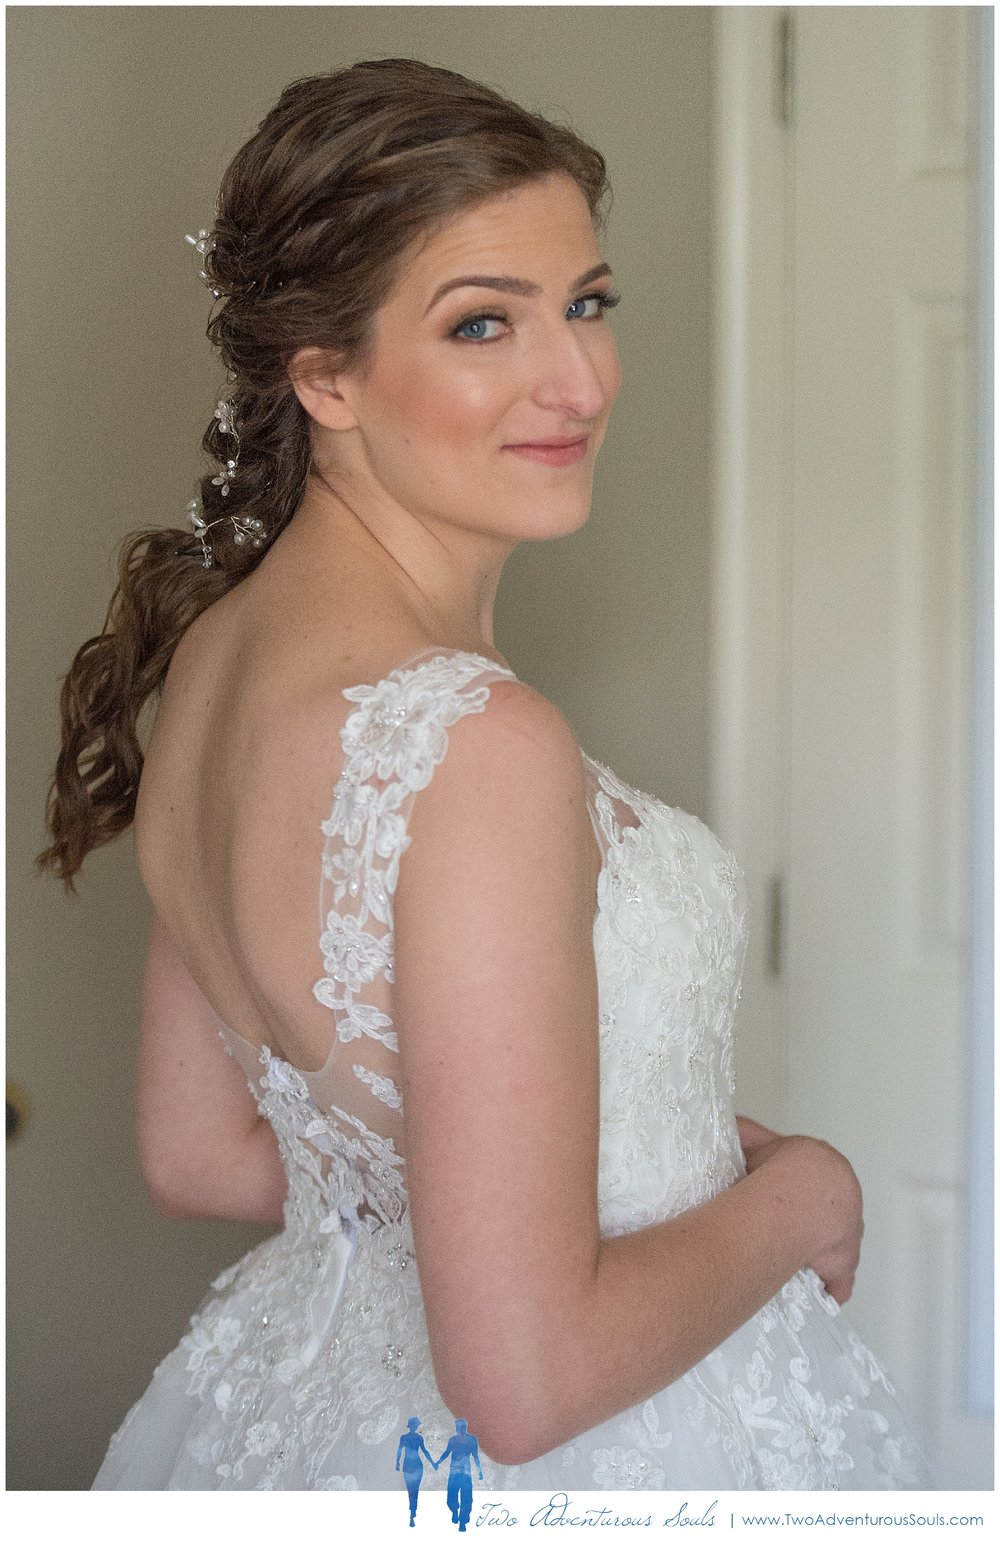 Quakertown-Wedding-Photographers-Farm-Wedding-Photographers-Two-Adventurous-Souls_0004.jpg